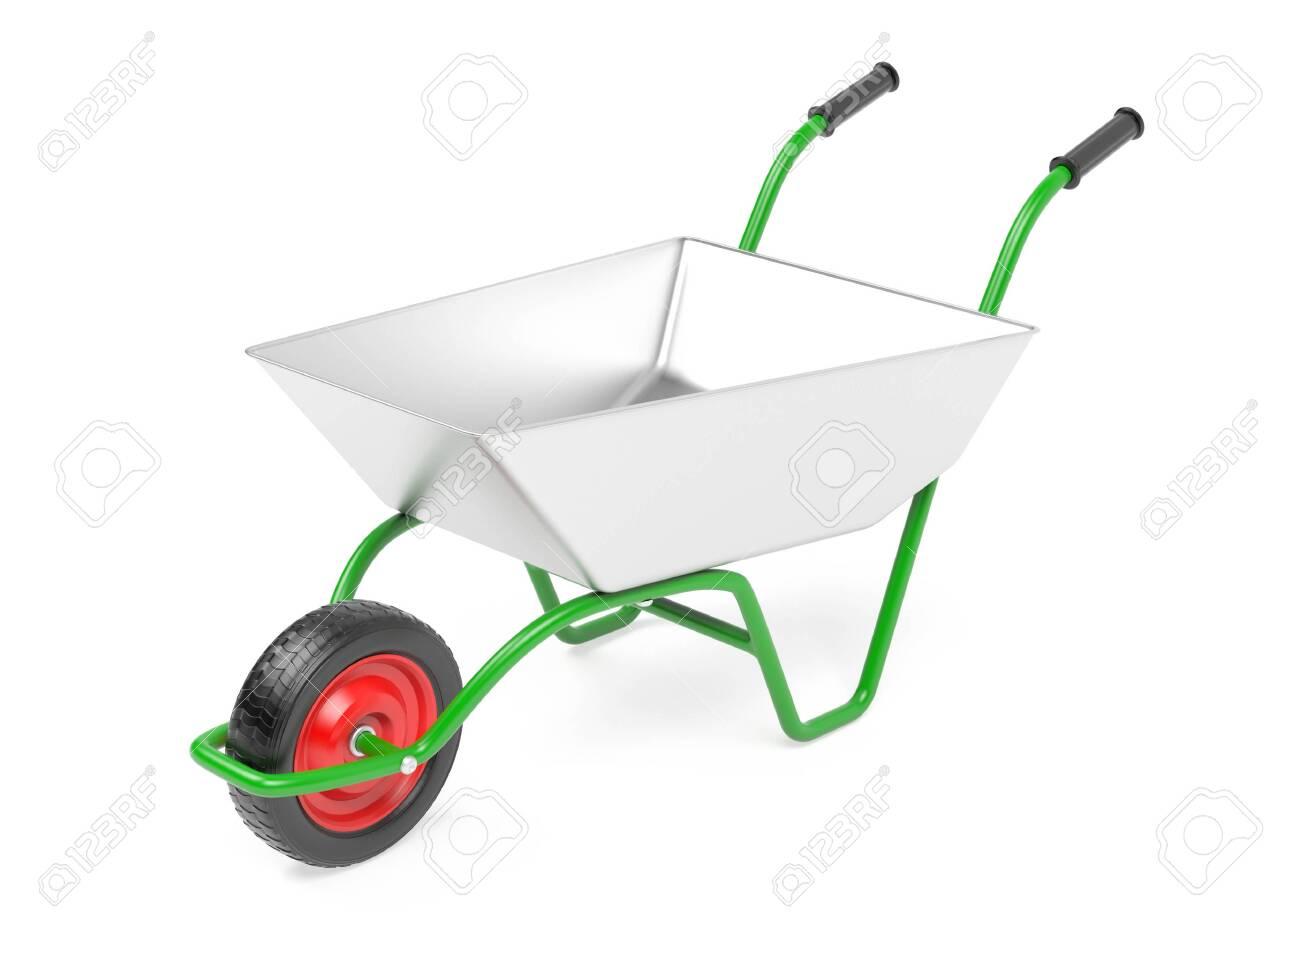 Garden barrow on one wheel. 3d rendering illustration isolated on white background - 150524457